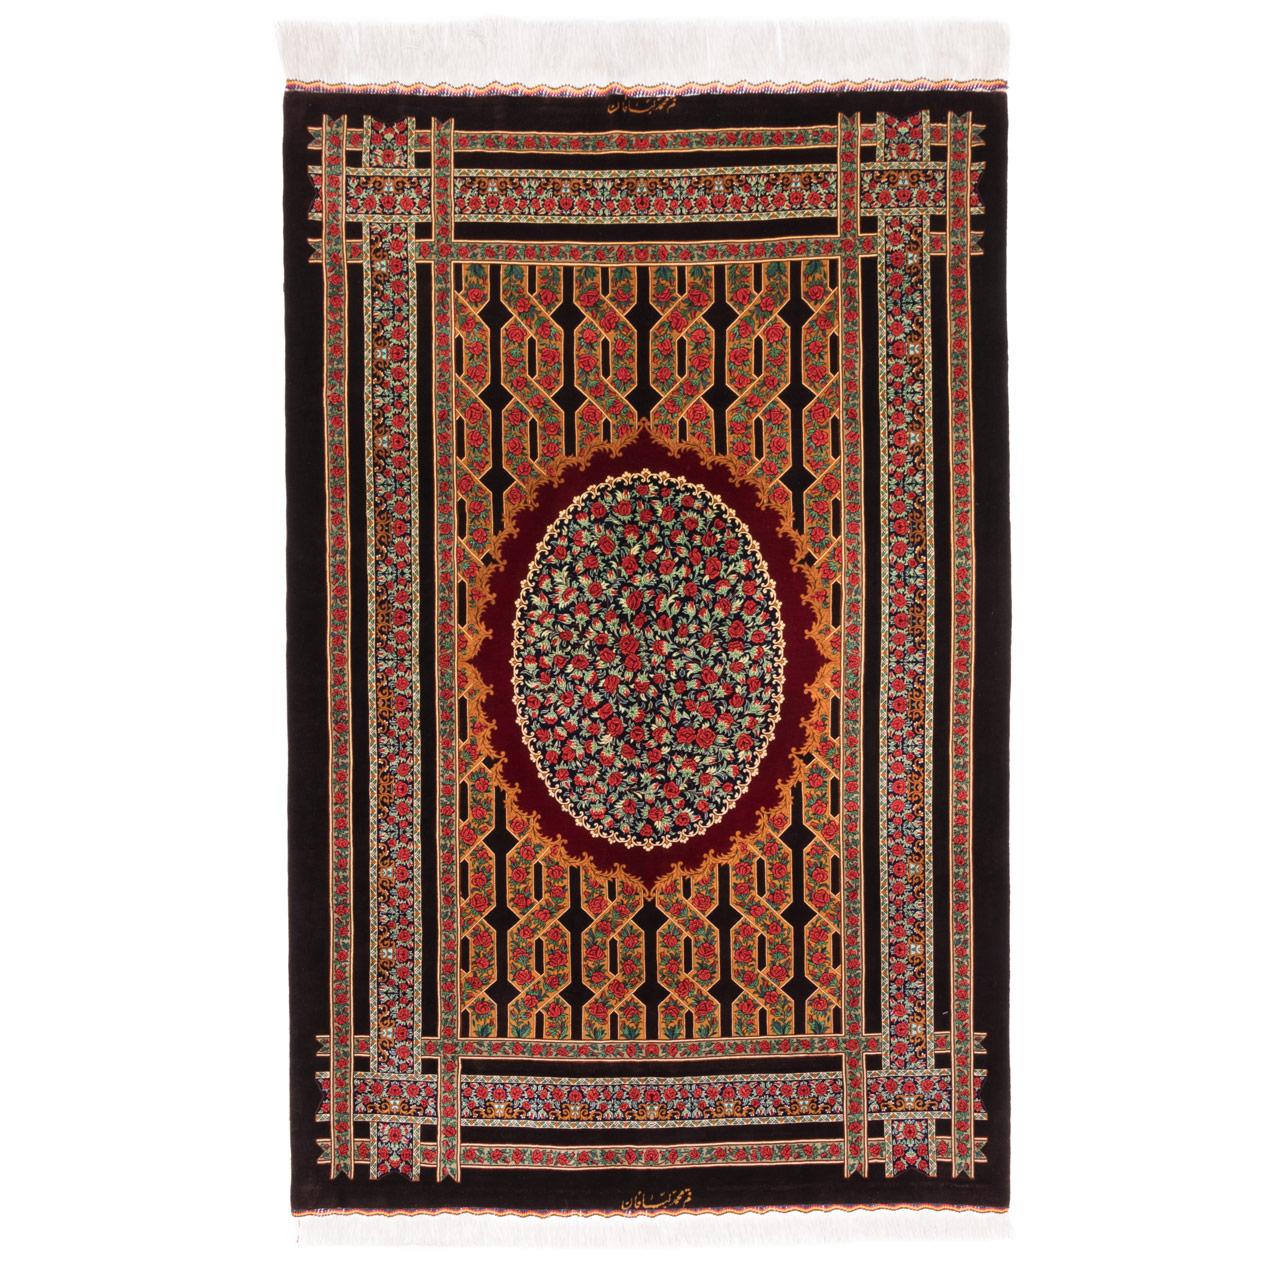 فرش دستباف ذرع و نیم سی پرشیا کد 131834